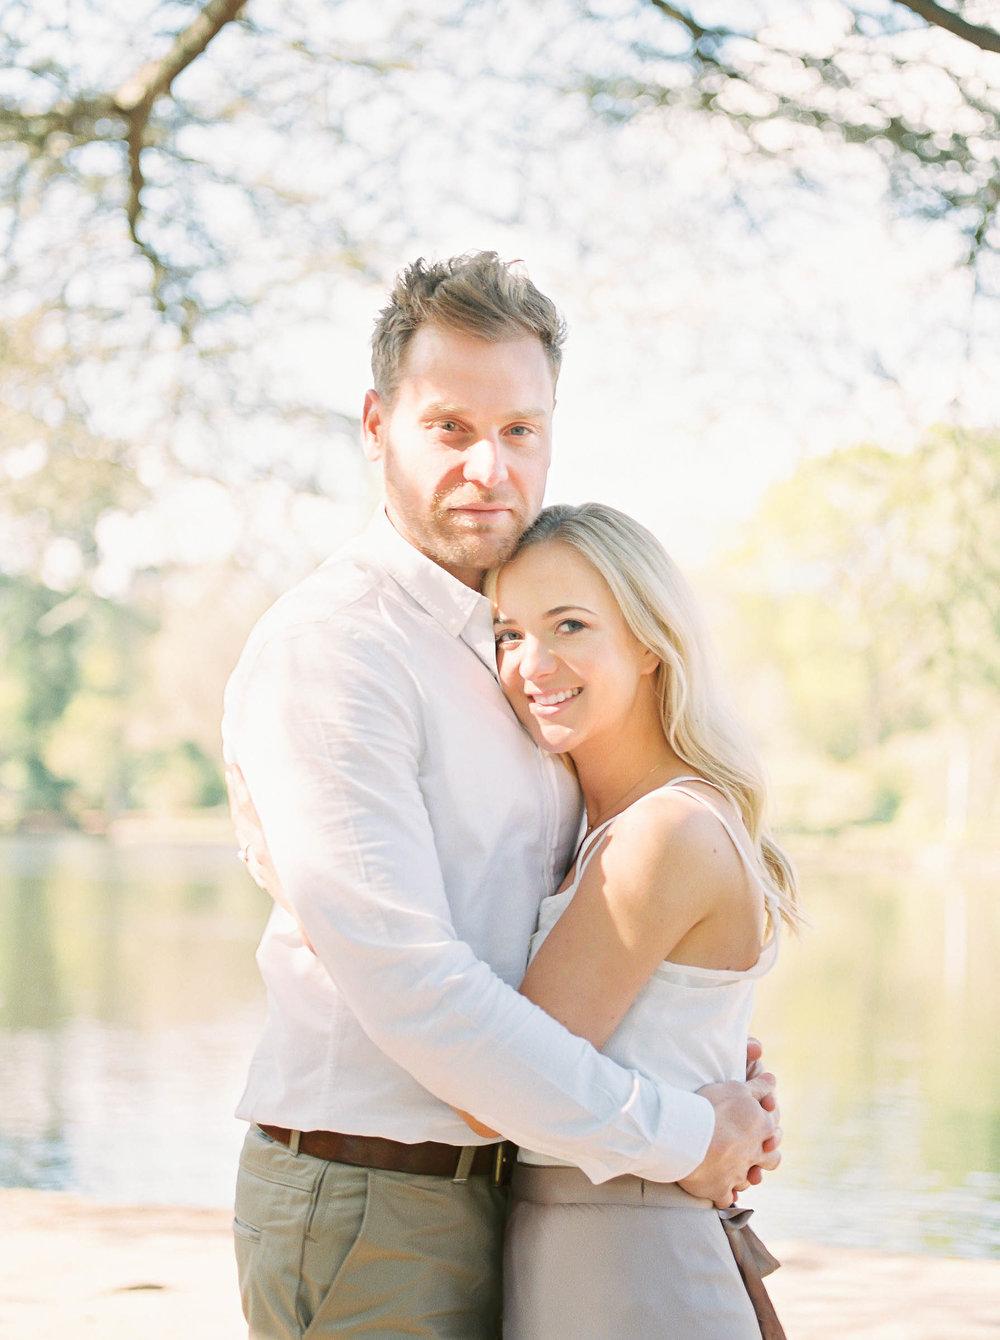 Amy O'Boyle Photography- Destination & UK Fine Art Film Wedding Photographer- Sheffield Park Garden National Trust Spring Engagement Shoot-25.jpg